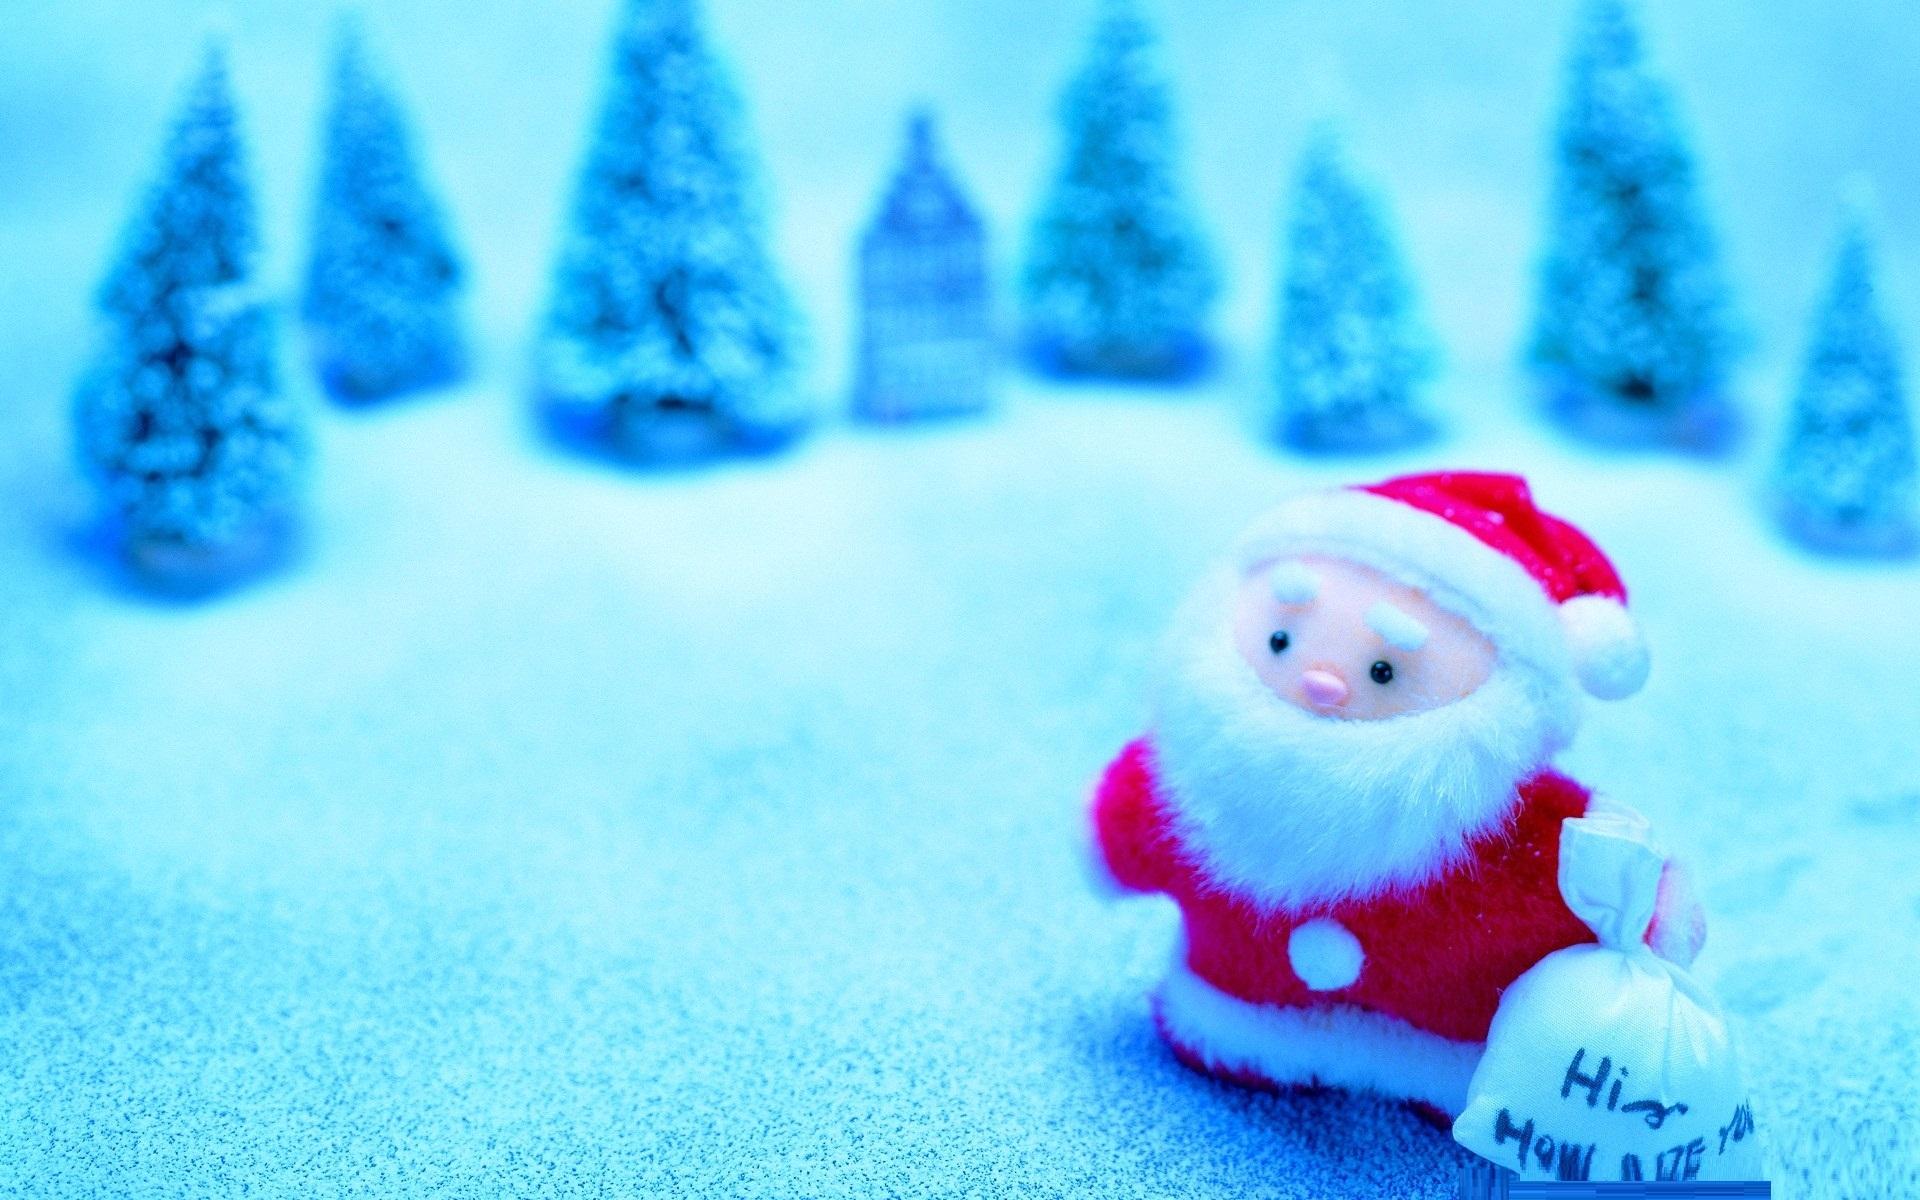 Cute Christmas Backgrounds Cute Christmas Desktop Backgrounds 1920x1200